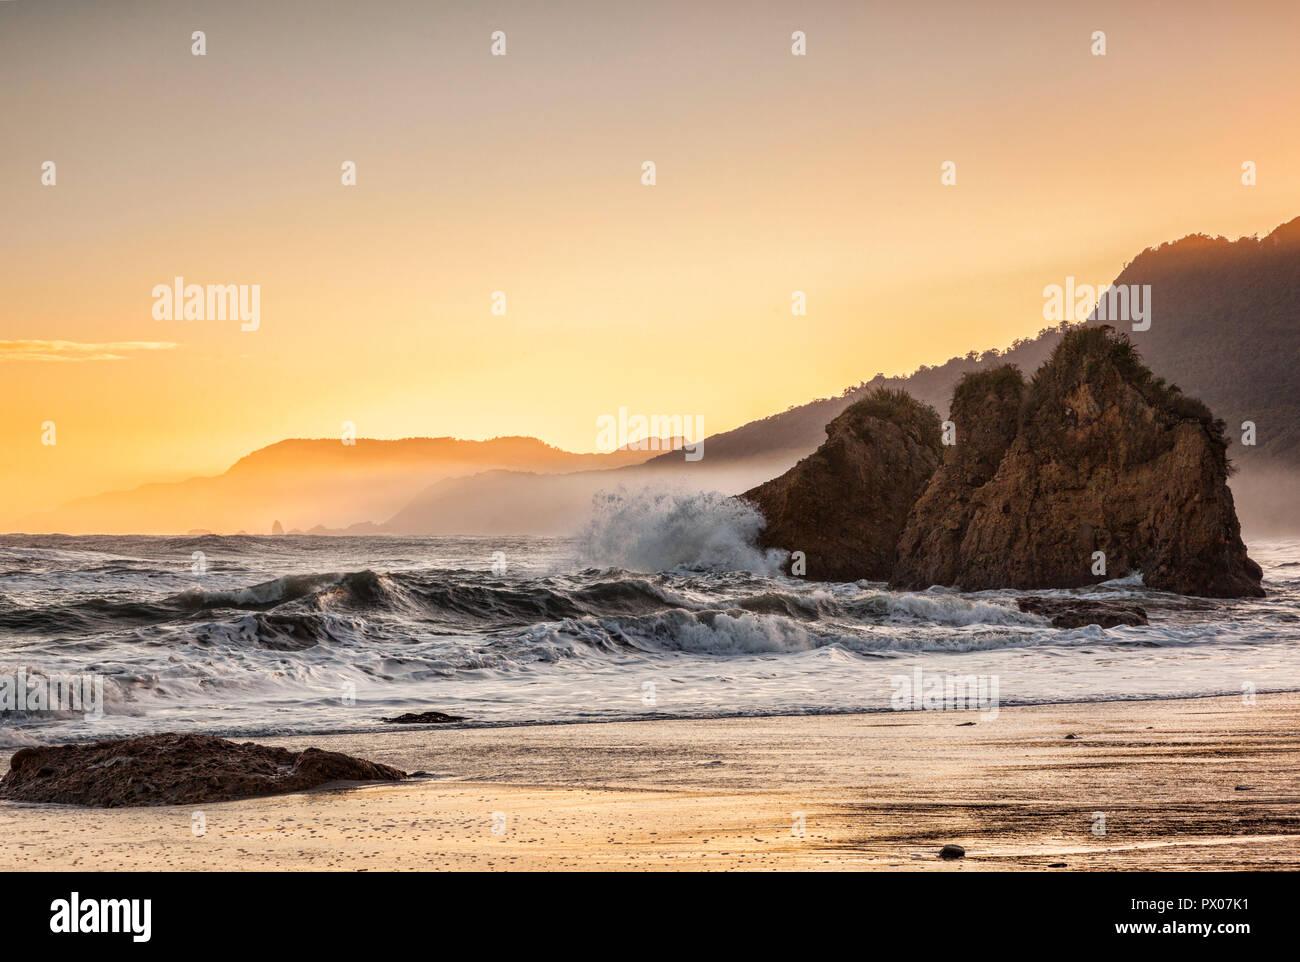 Una mattina selvatici al Picchio Bay, Paparoa National Park, West Coast, Nuova Zelanda Immagini Stock